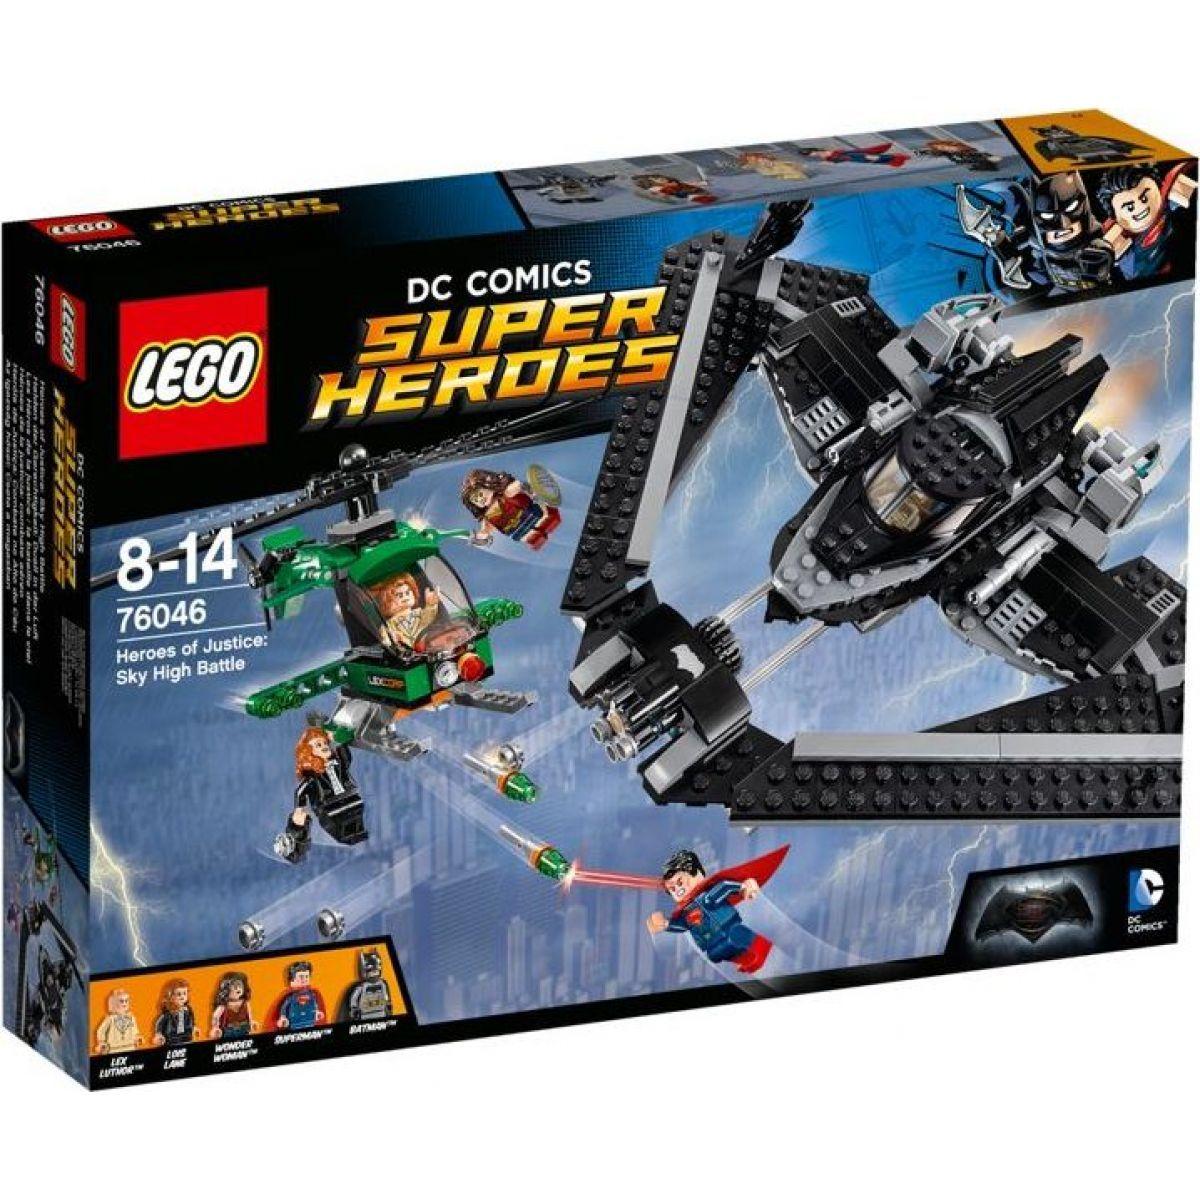 LEGO Super Heroes 76046 Hrdinové spravedlnosti Souboj vysoko v oblacích